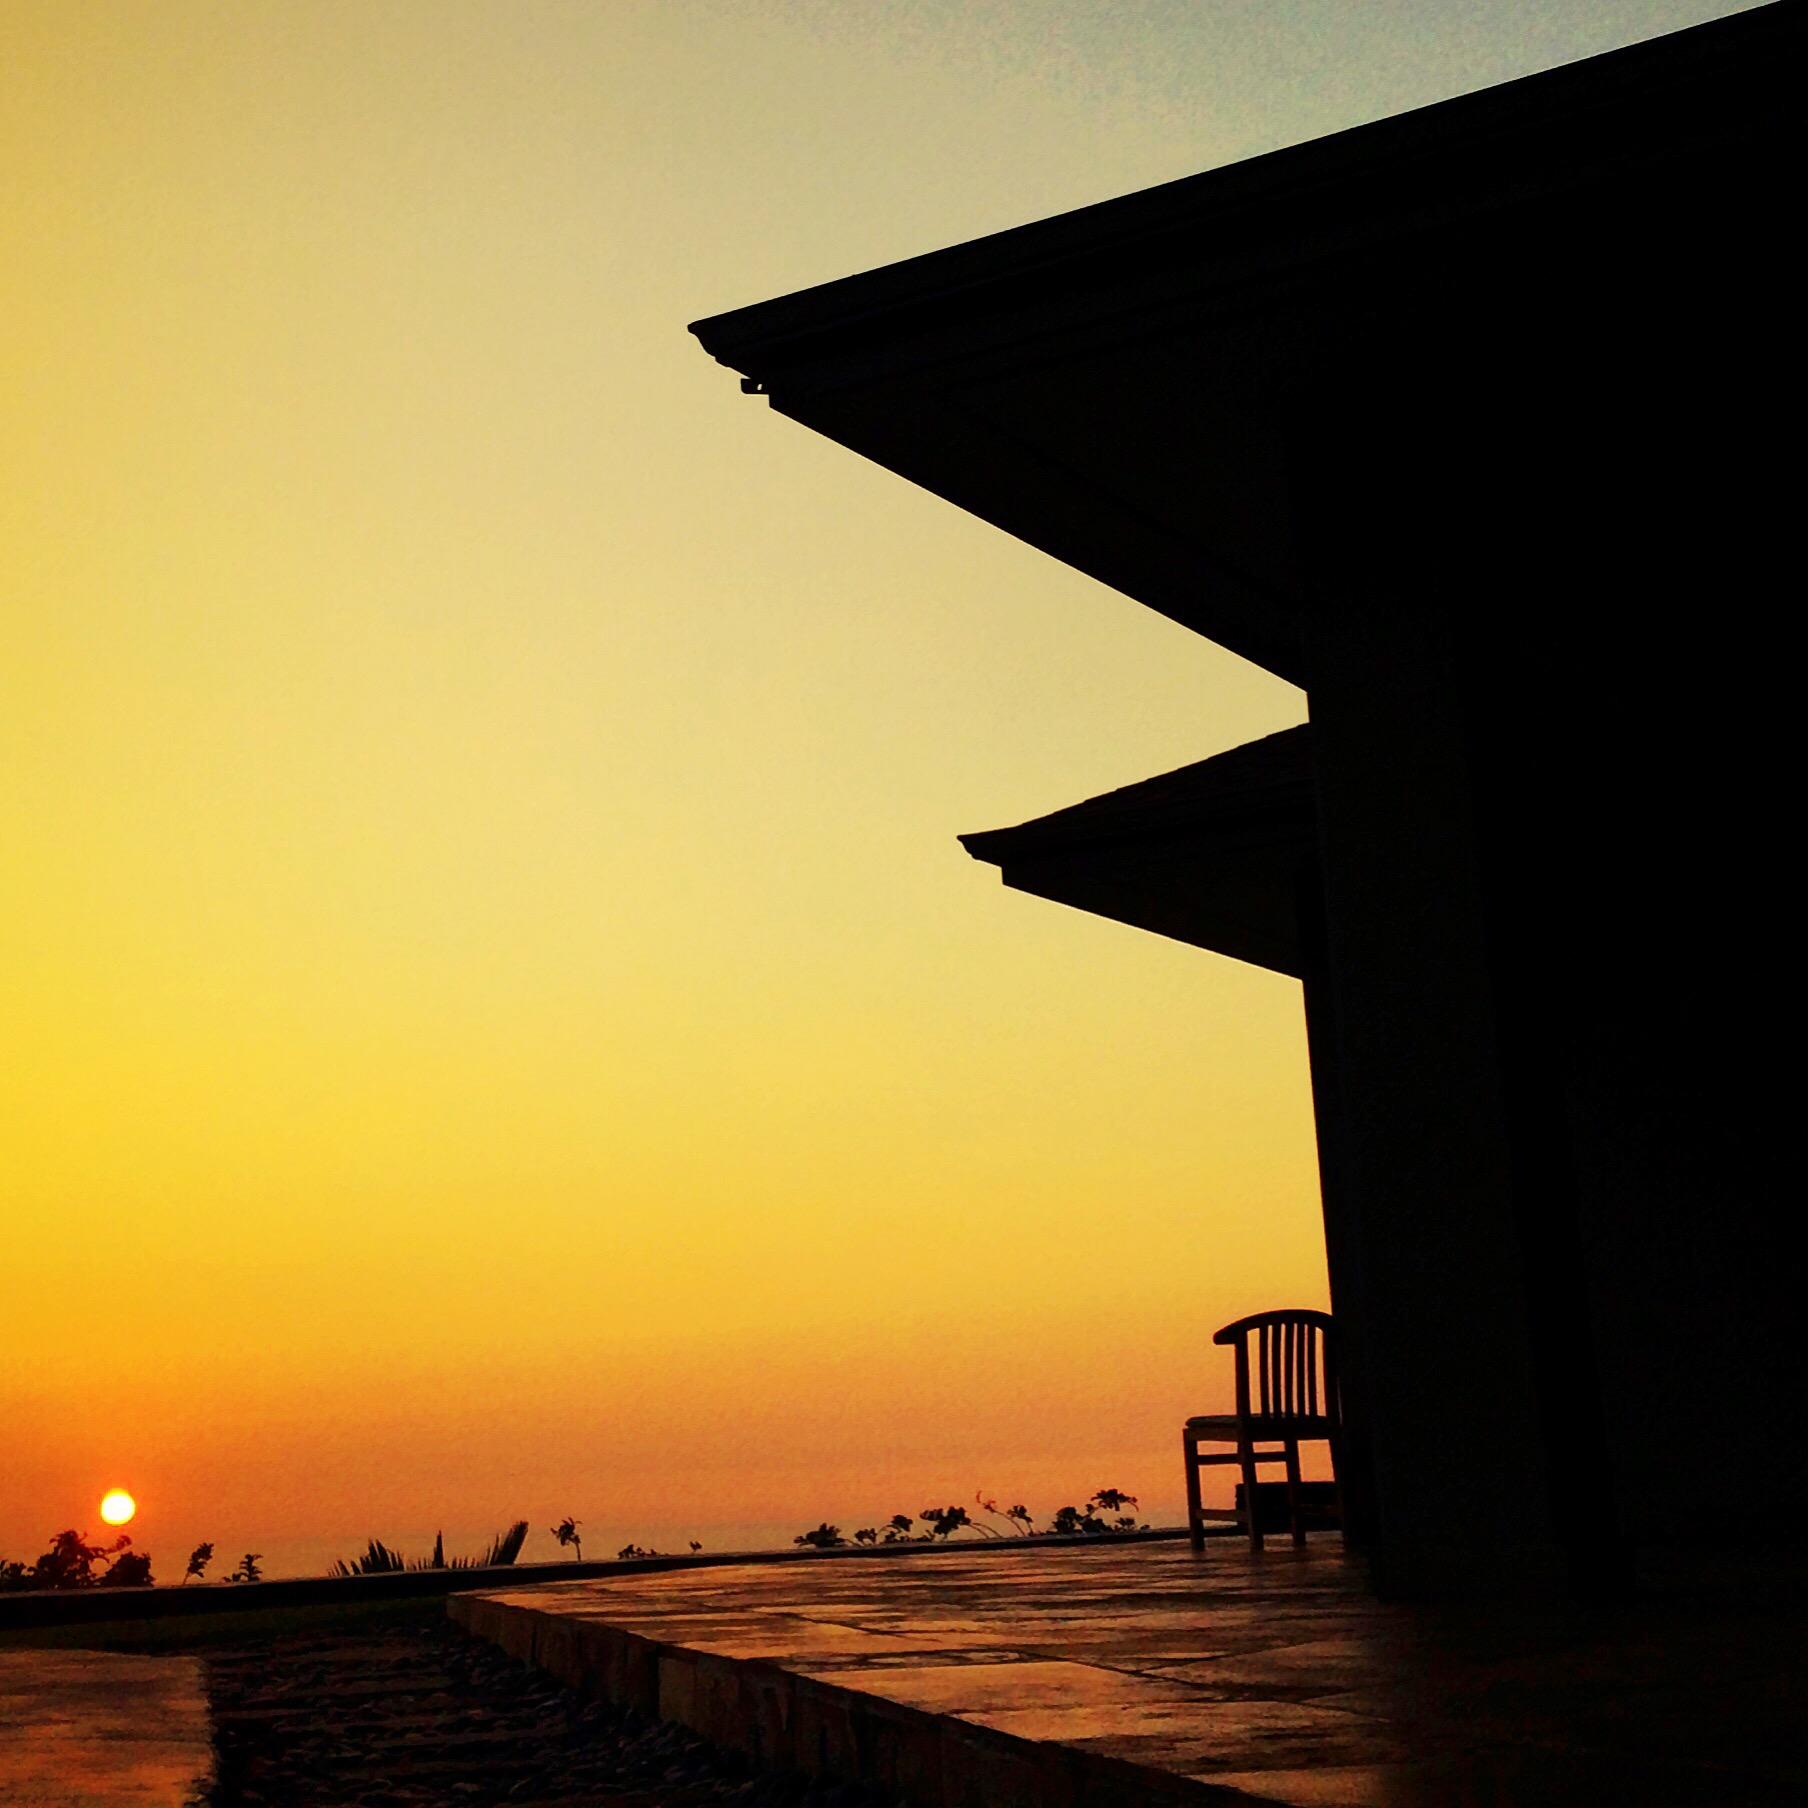 sunset_chair.jpg